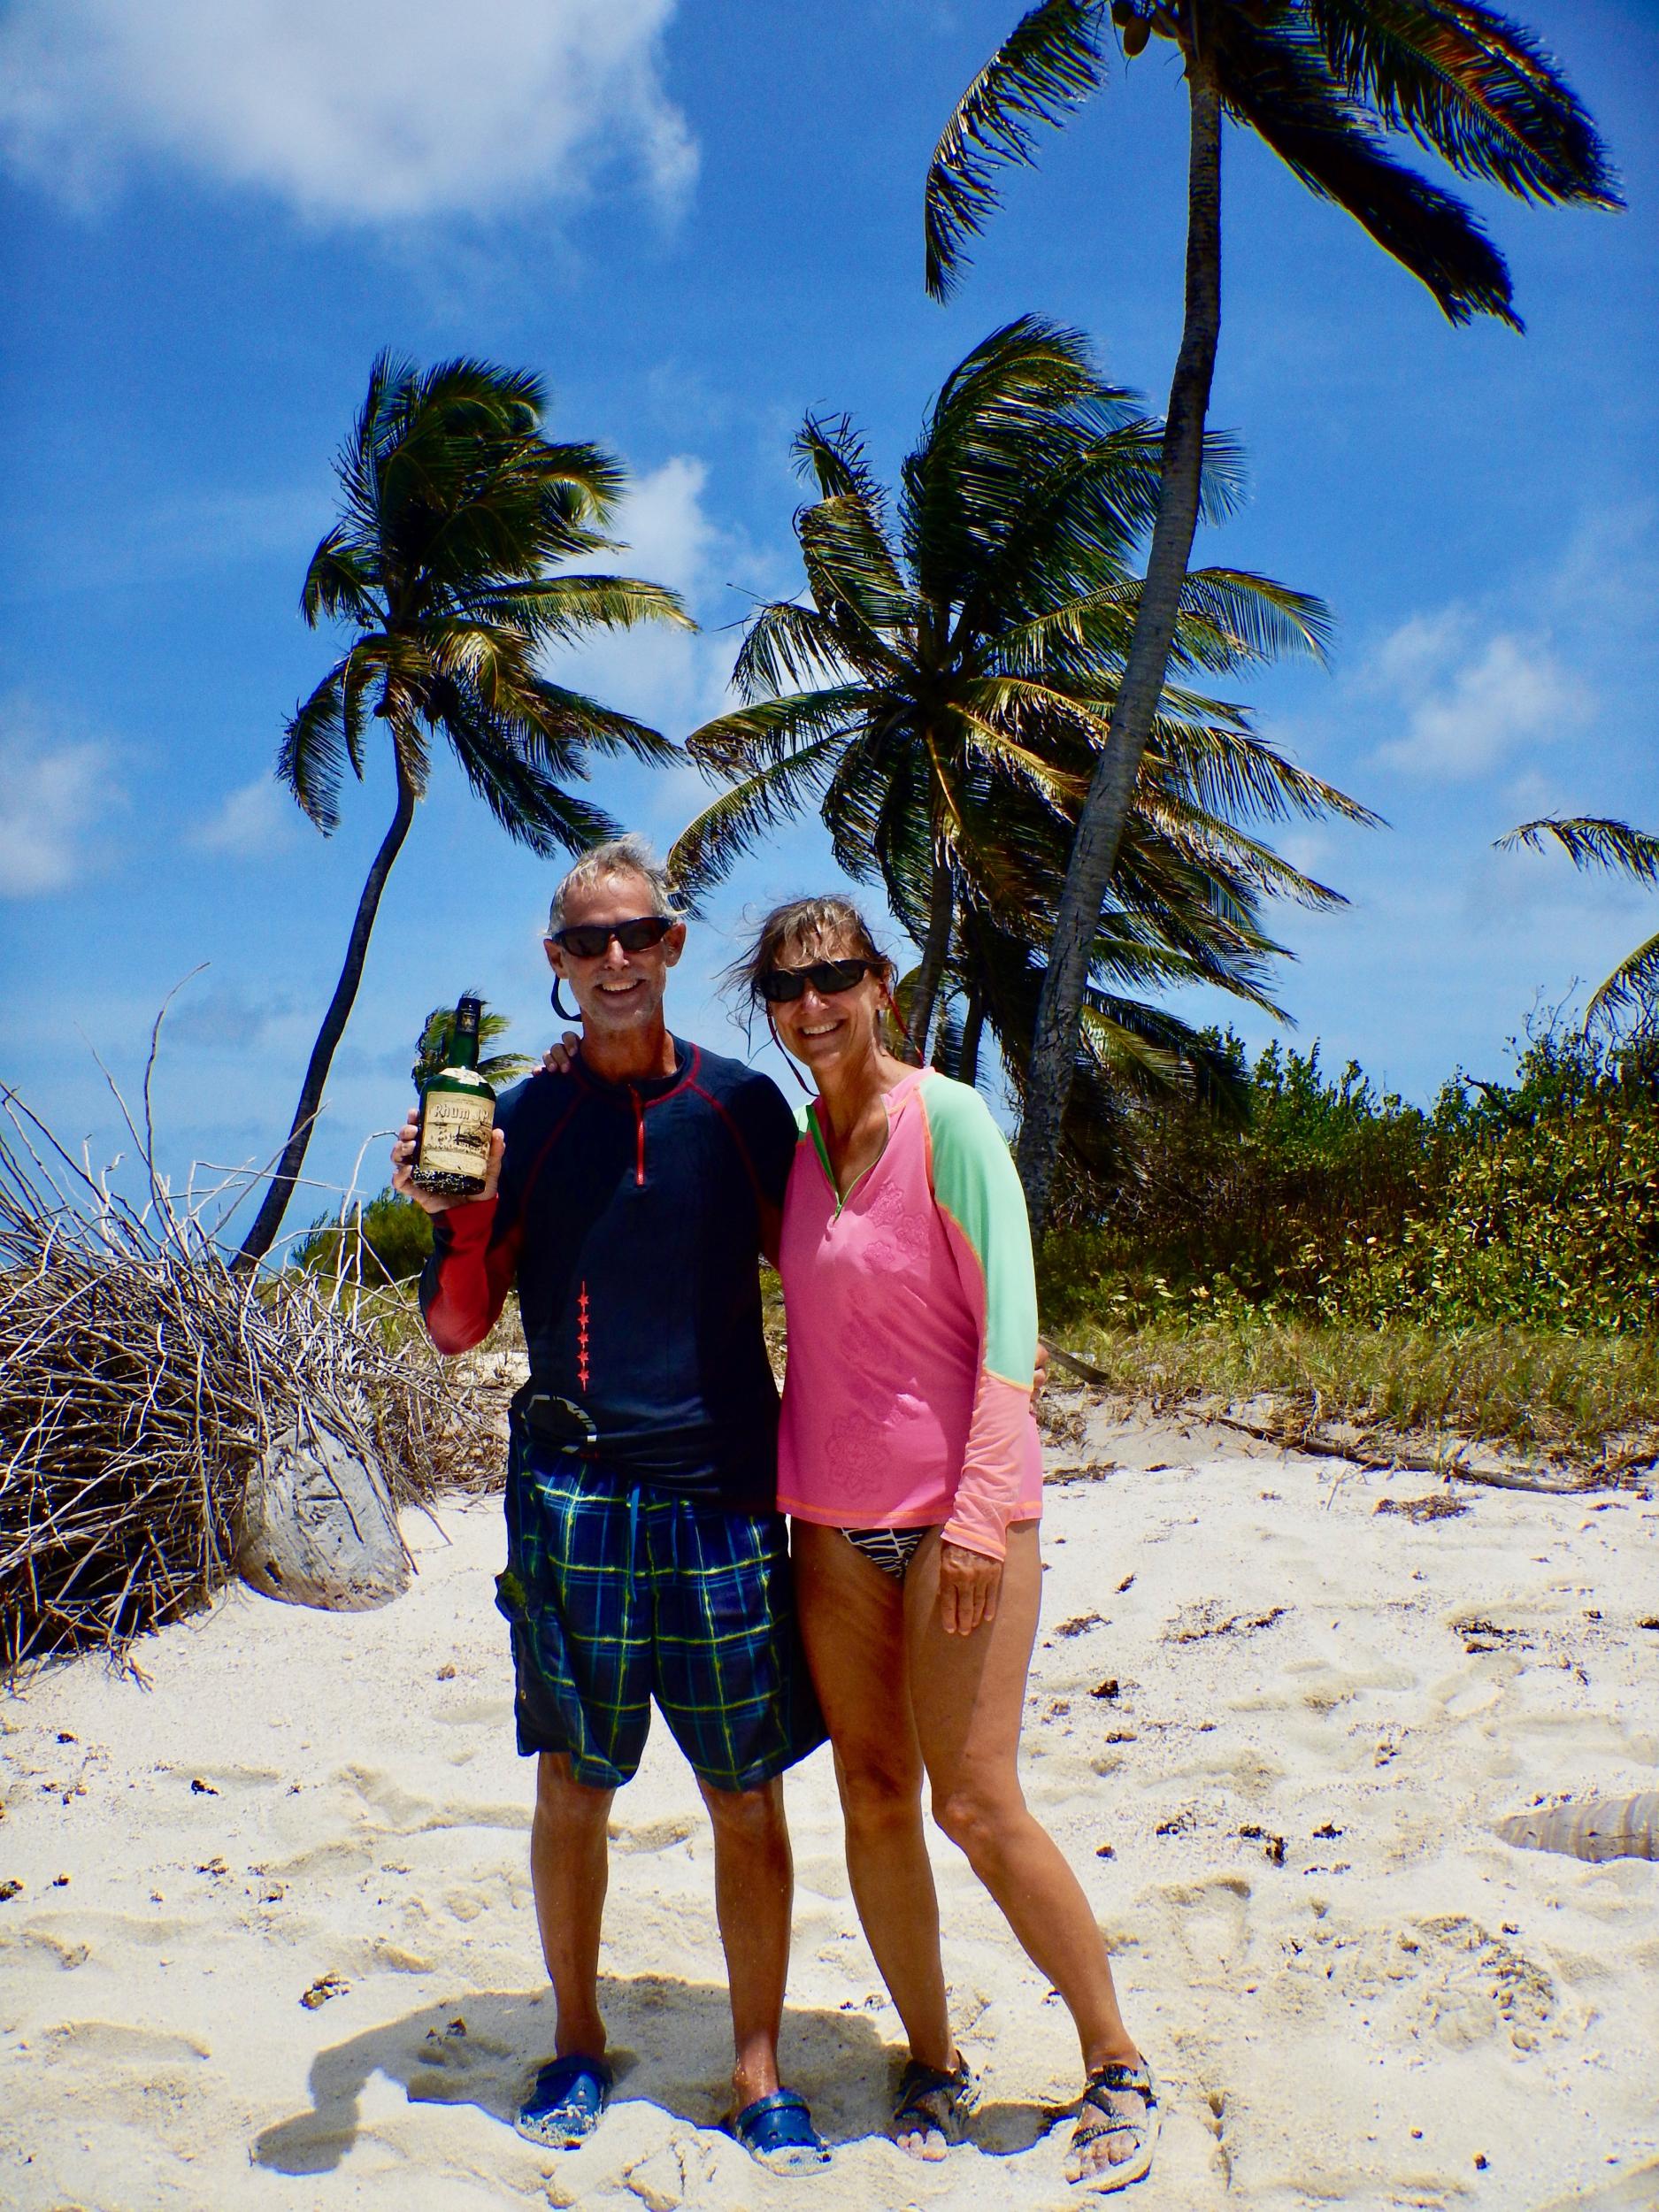 25. Found the rum!